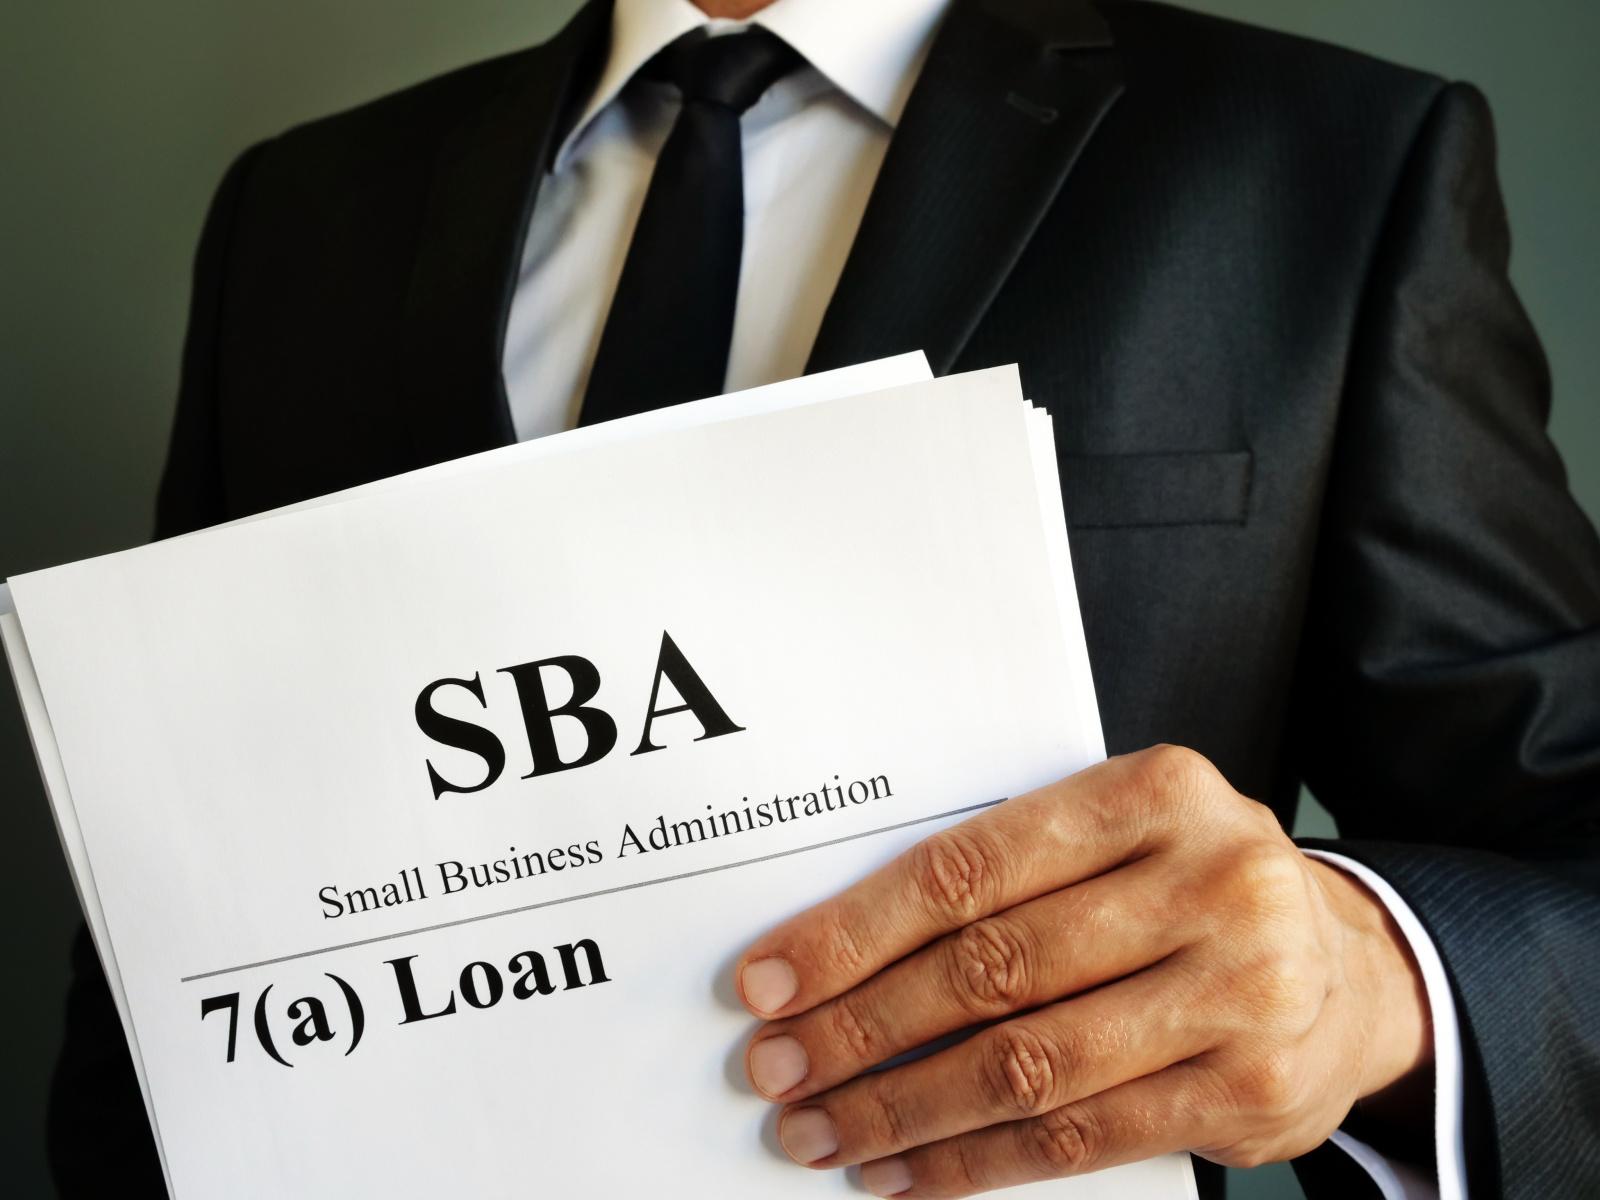 SBA Loan Image